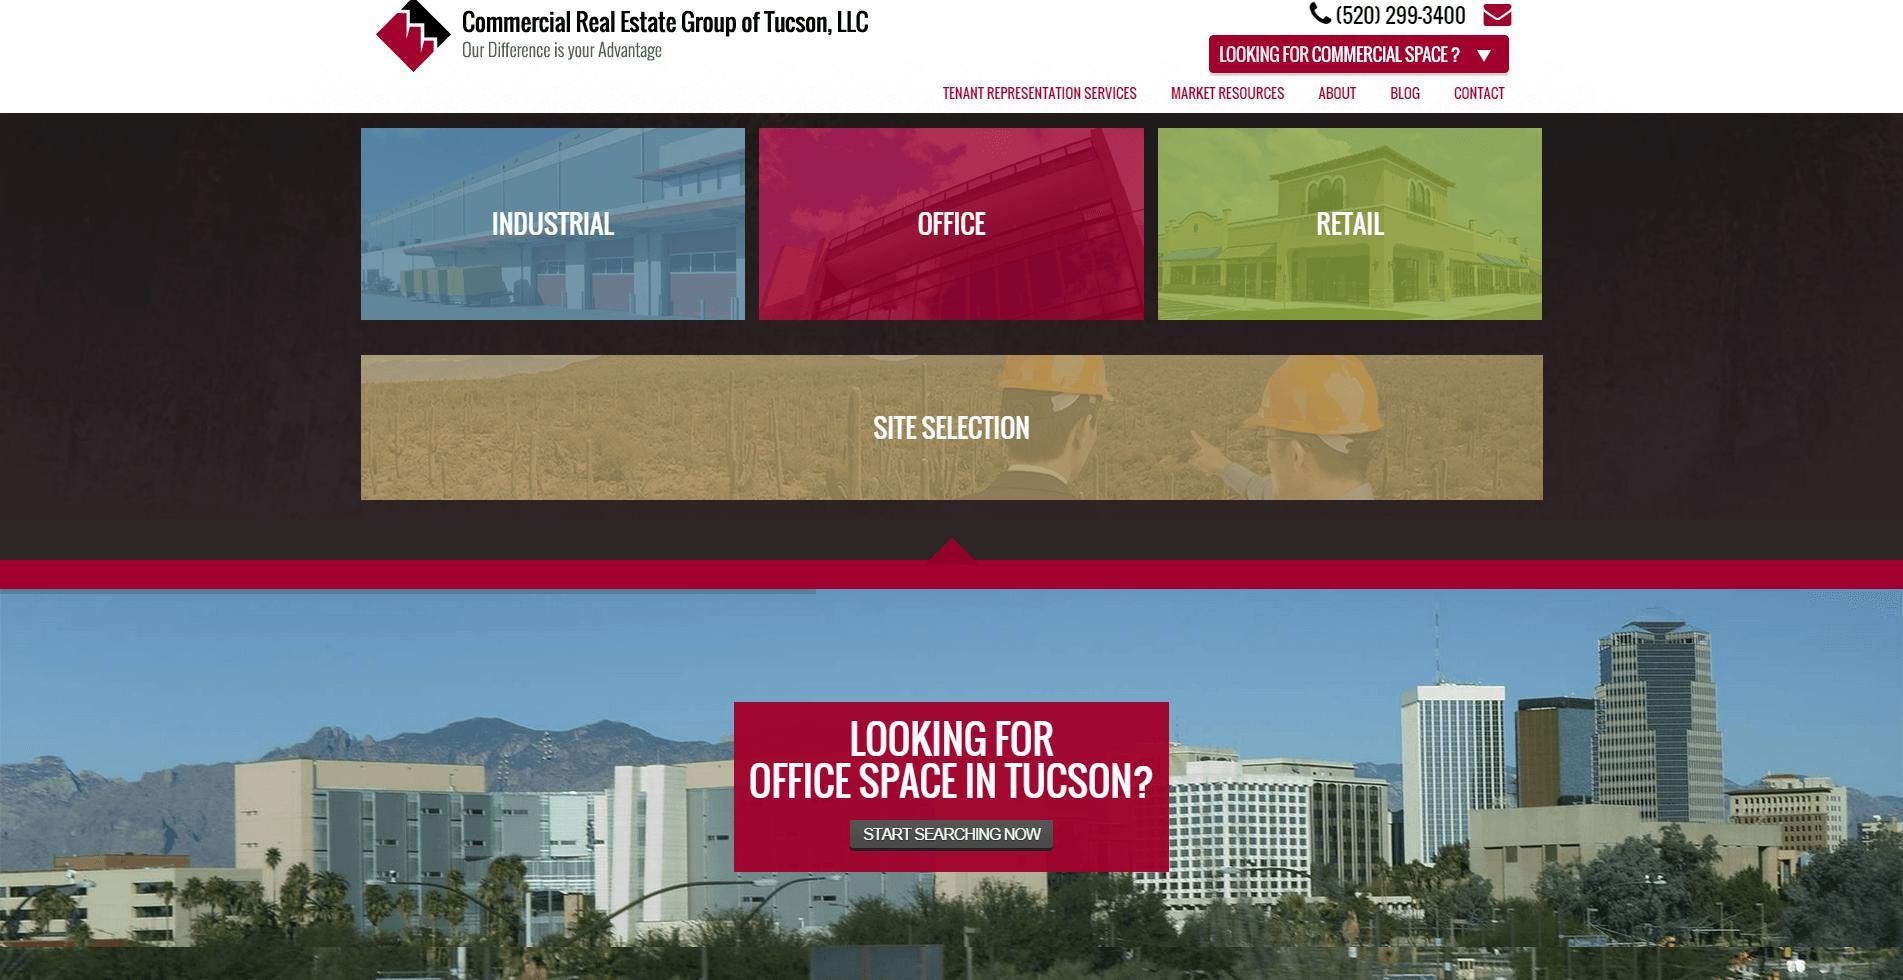 2015 Wordpress Design Portfolio Commercial Real Estate Group of Tucson  LLC Markets